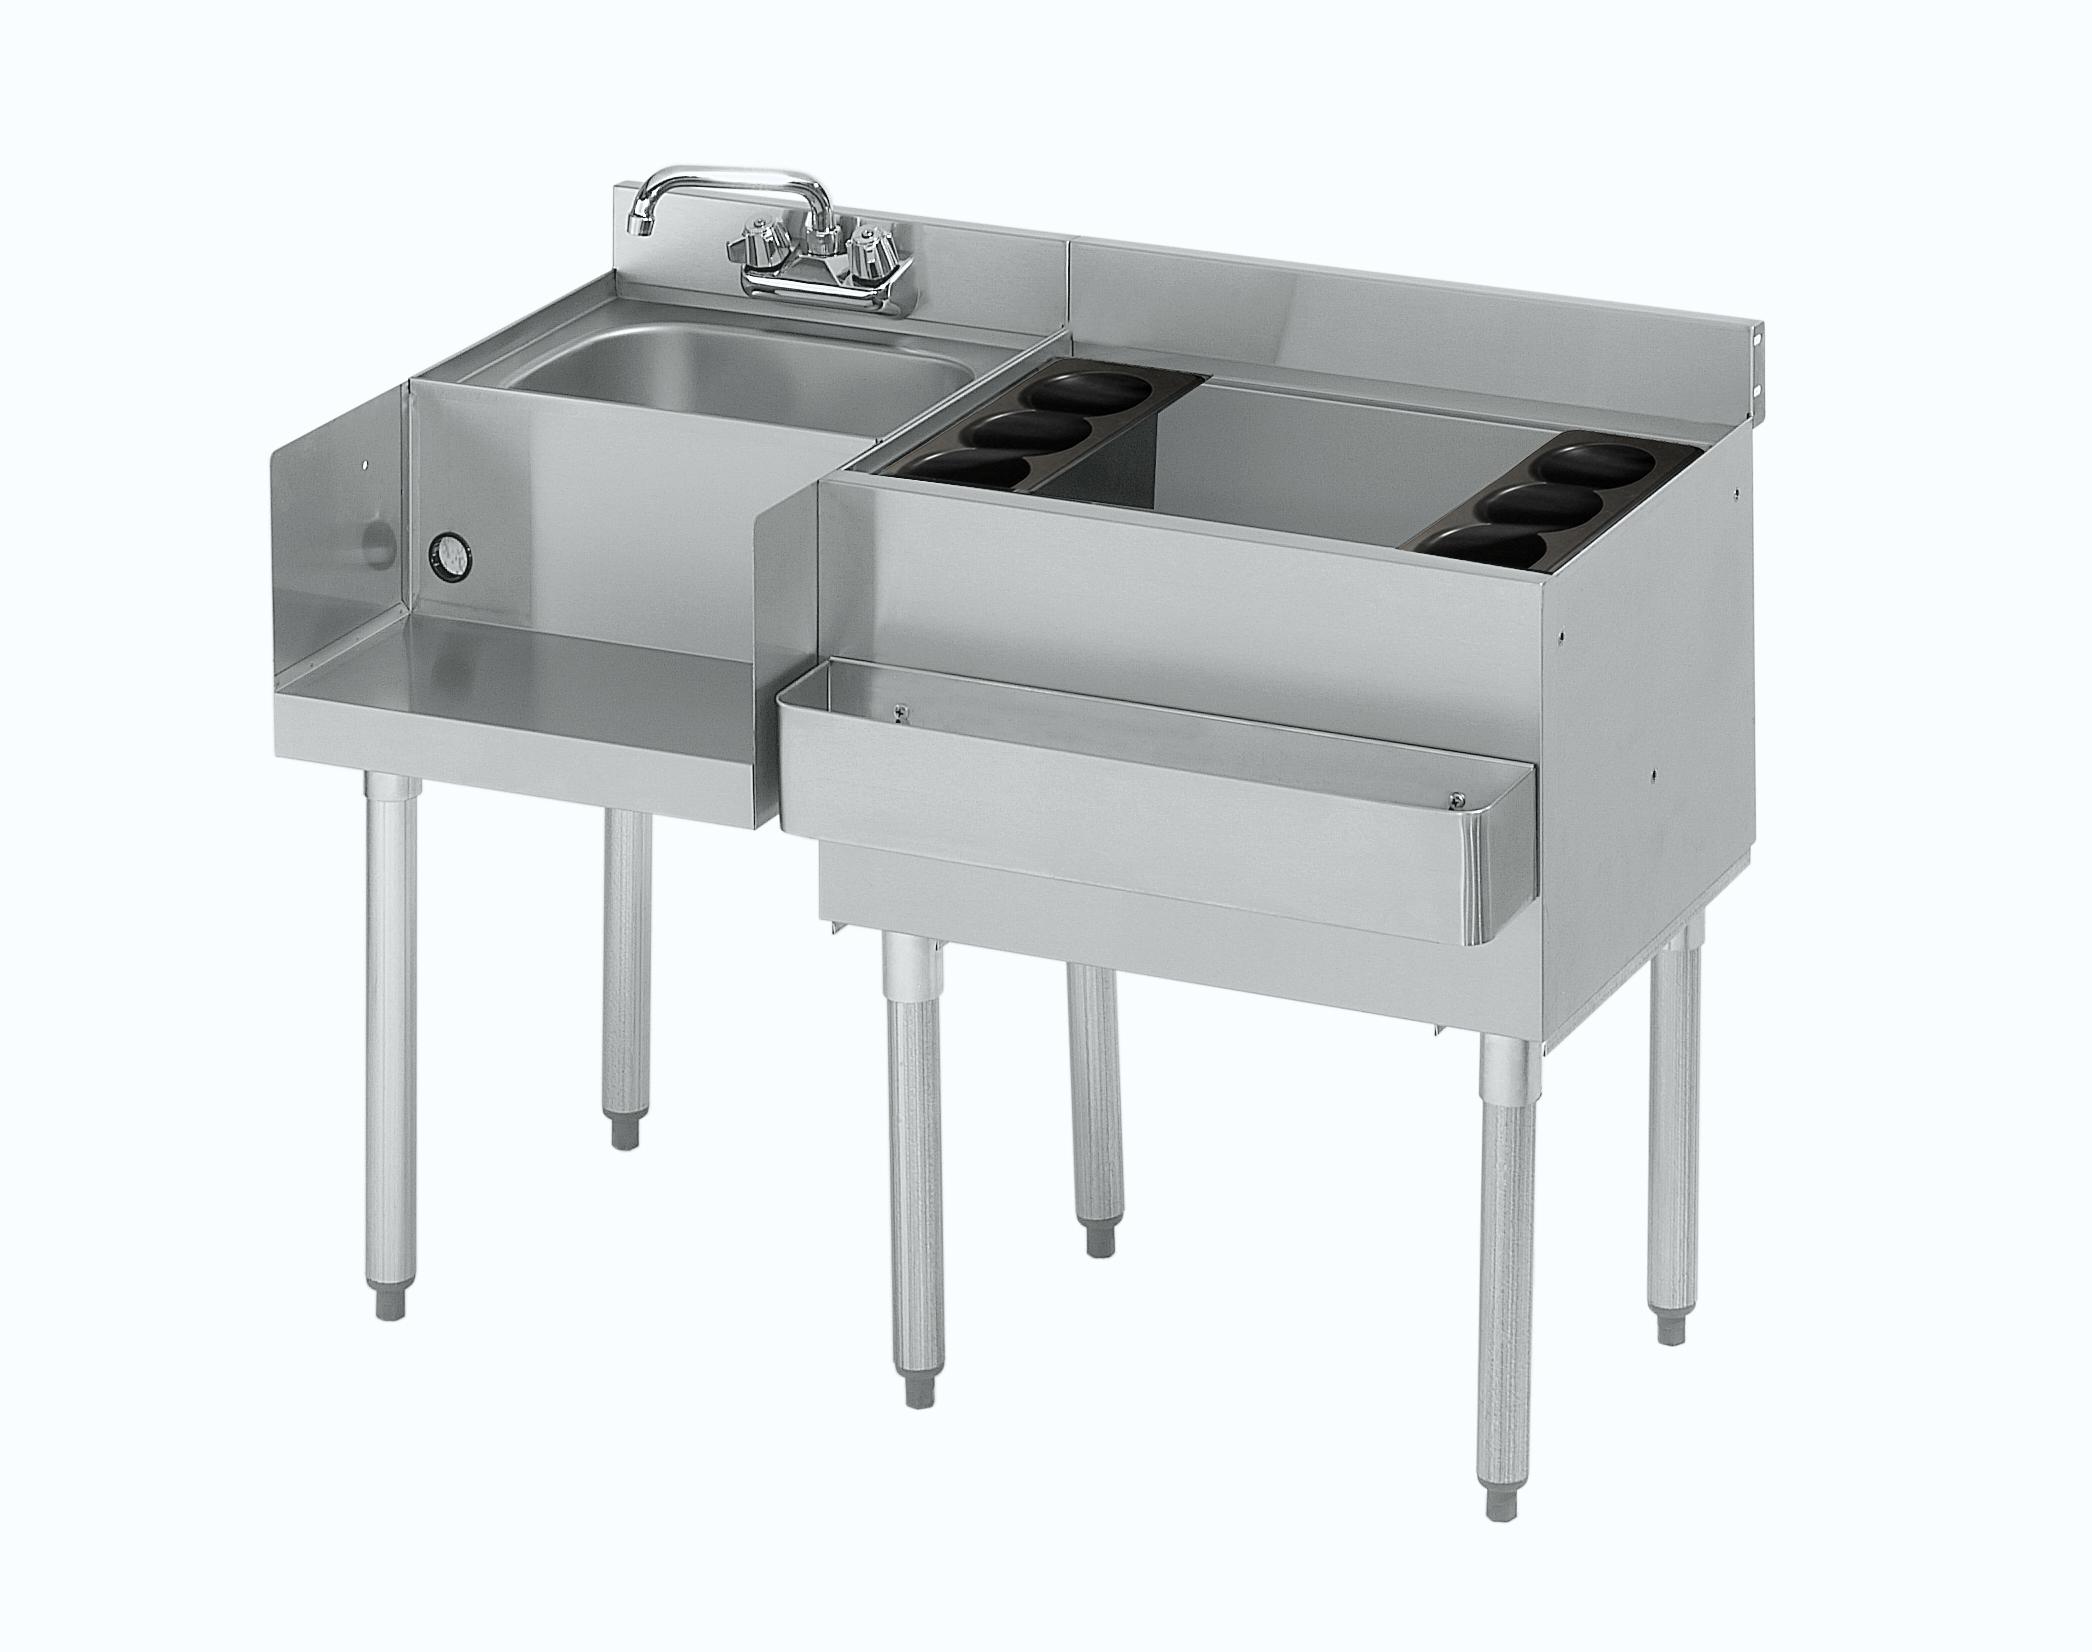 Krowne Metal 18-W54R-7 underbar ice bin/cocktail station, blender station